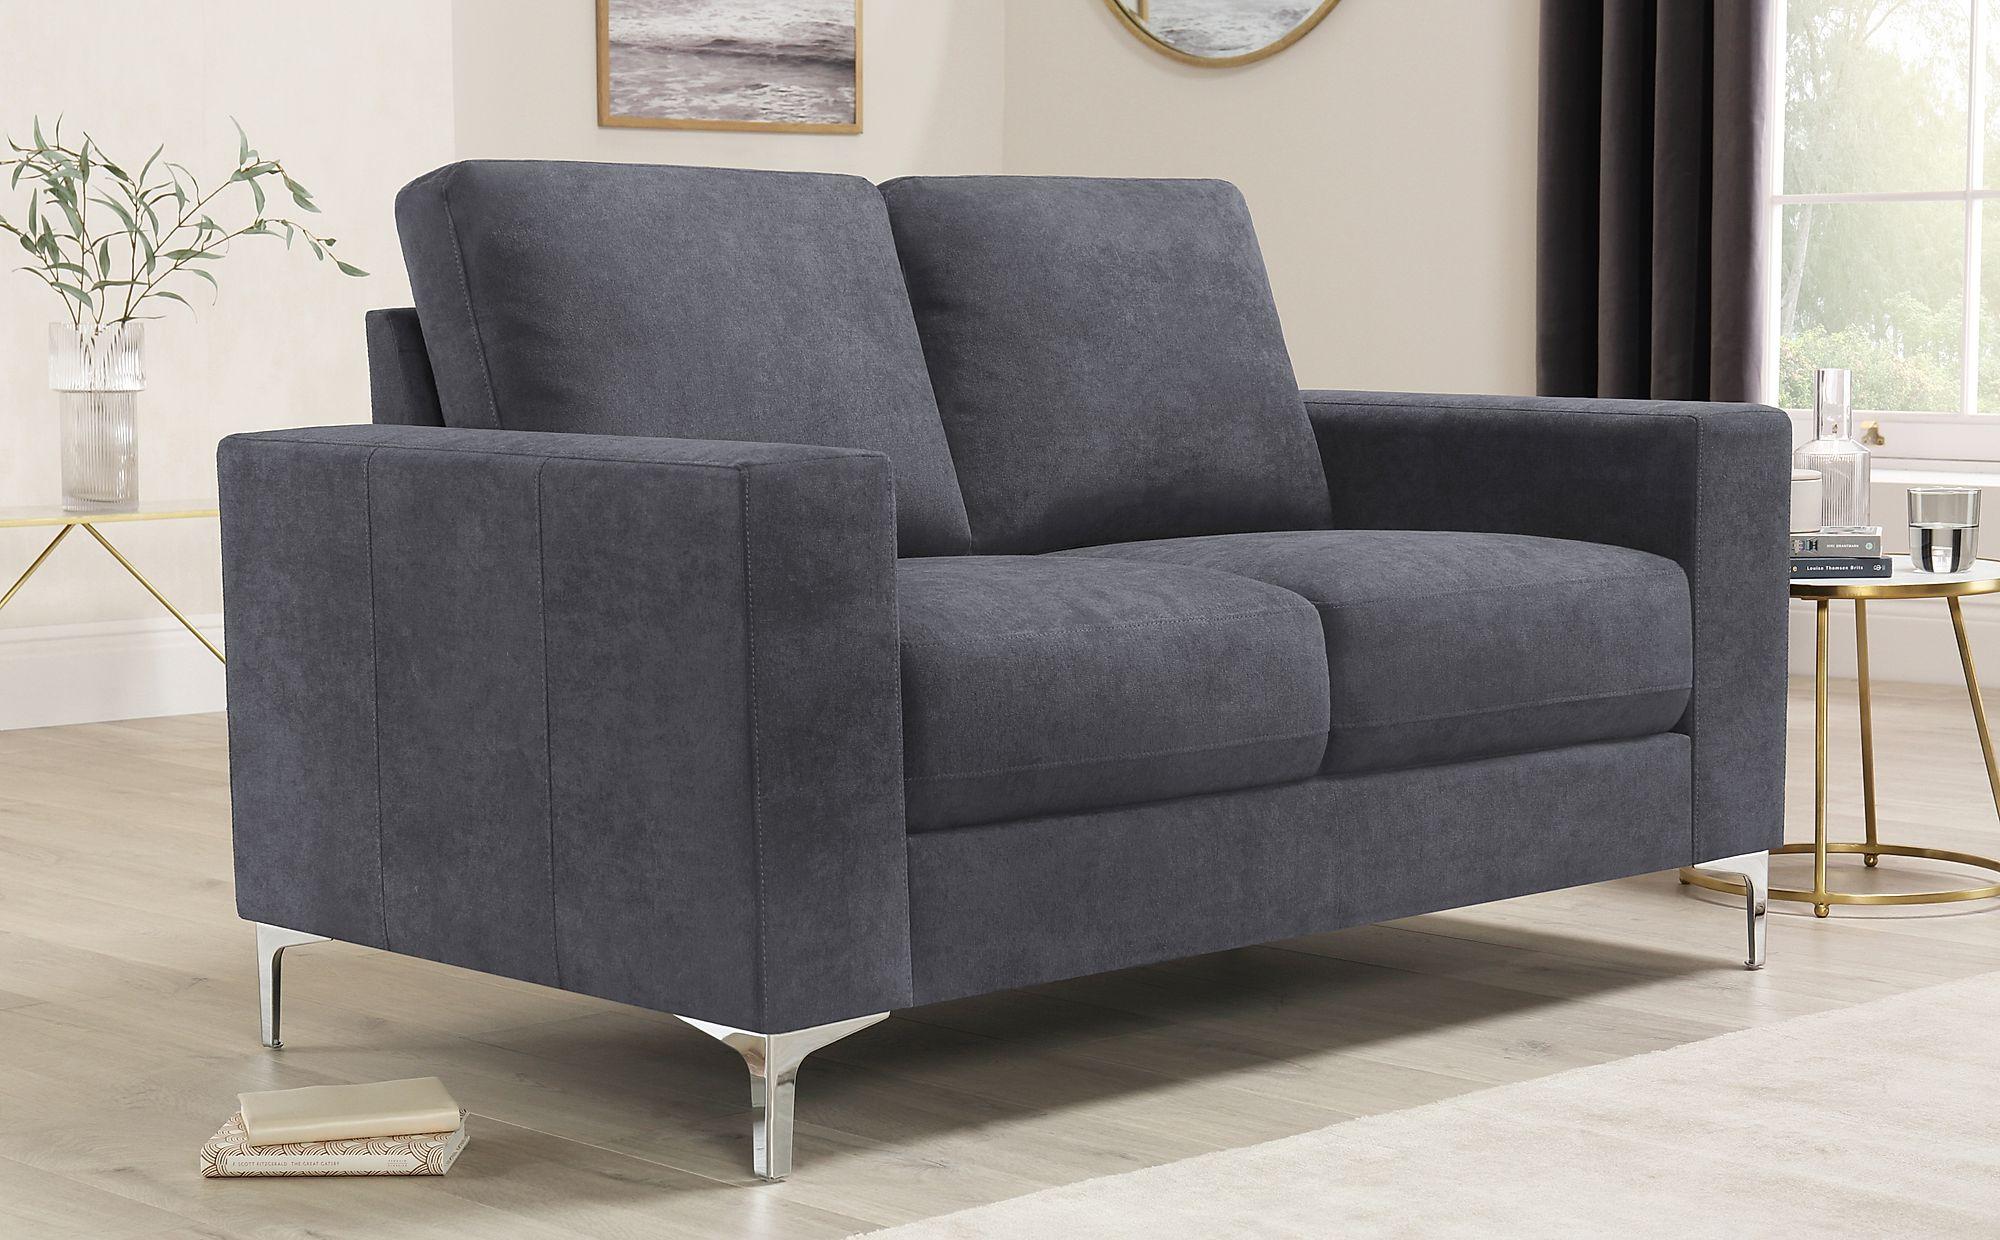 a5e8337289 Baltimore Slate Grey Plush Fabric Sofa 2 Seater Only £349.99 ...